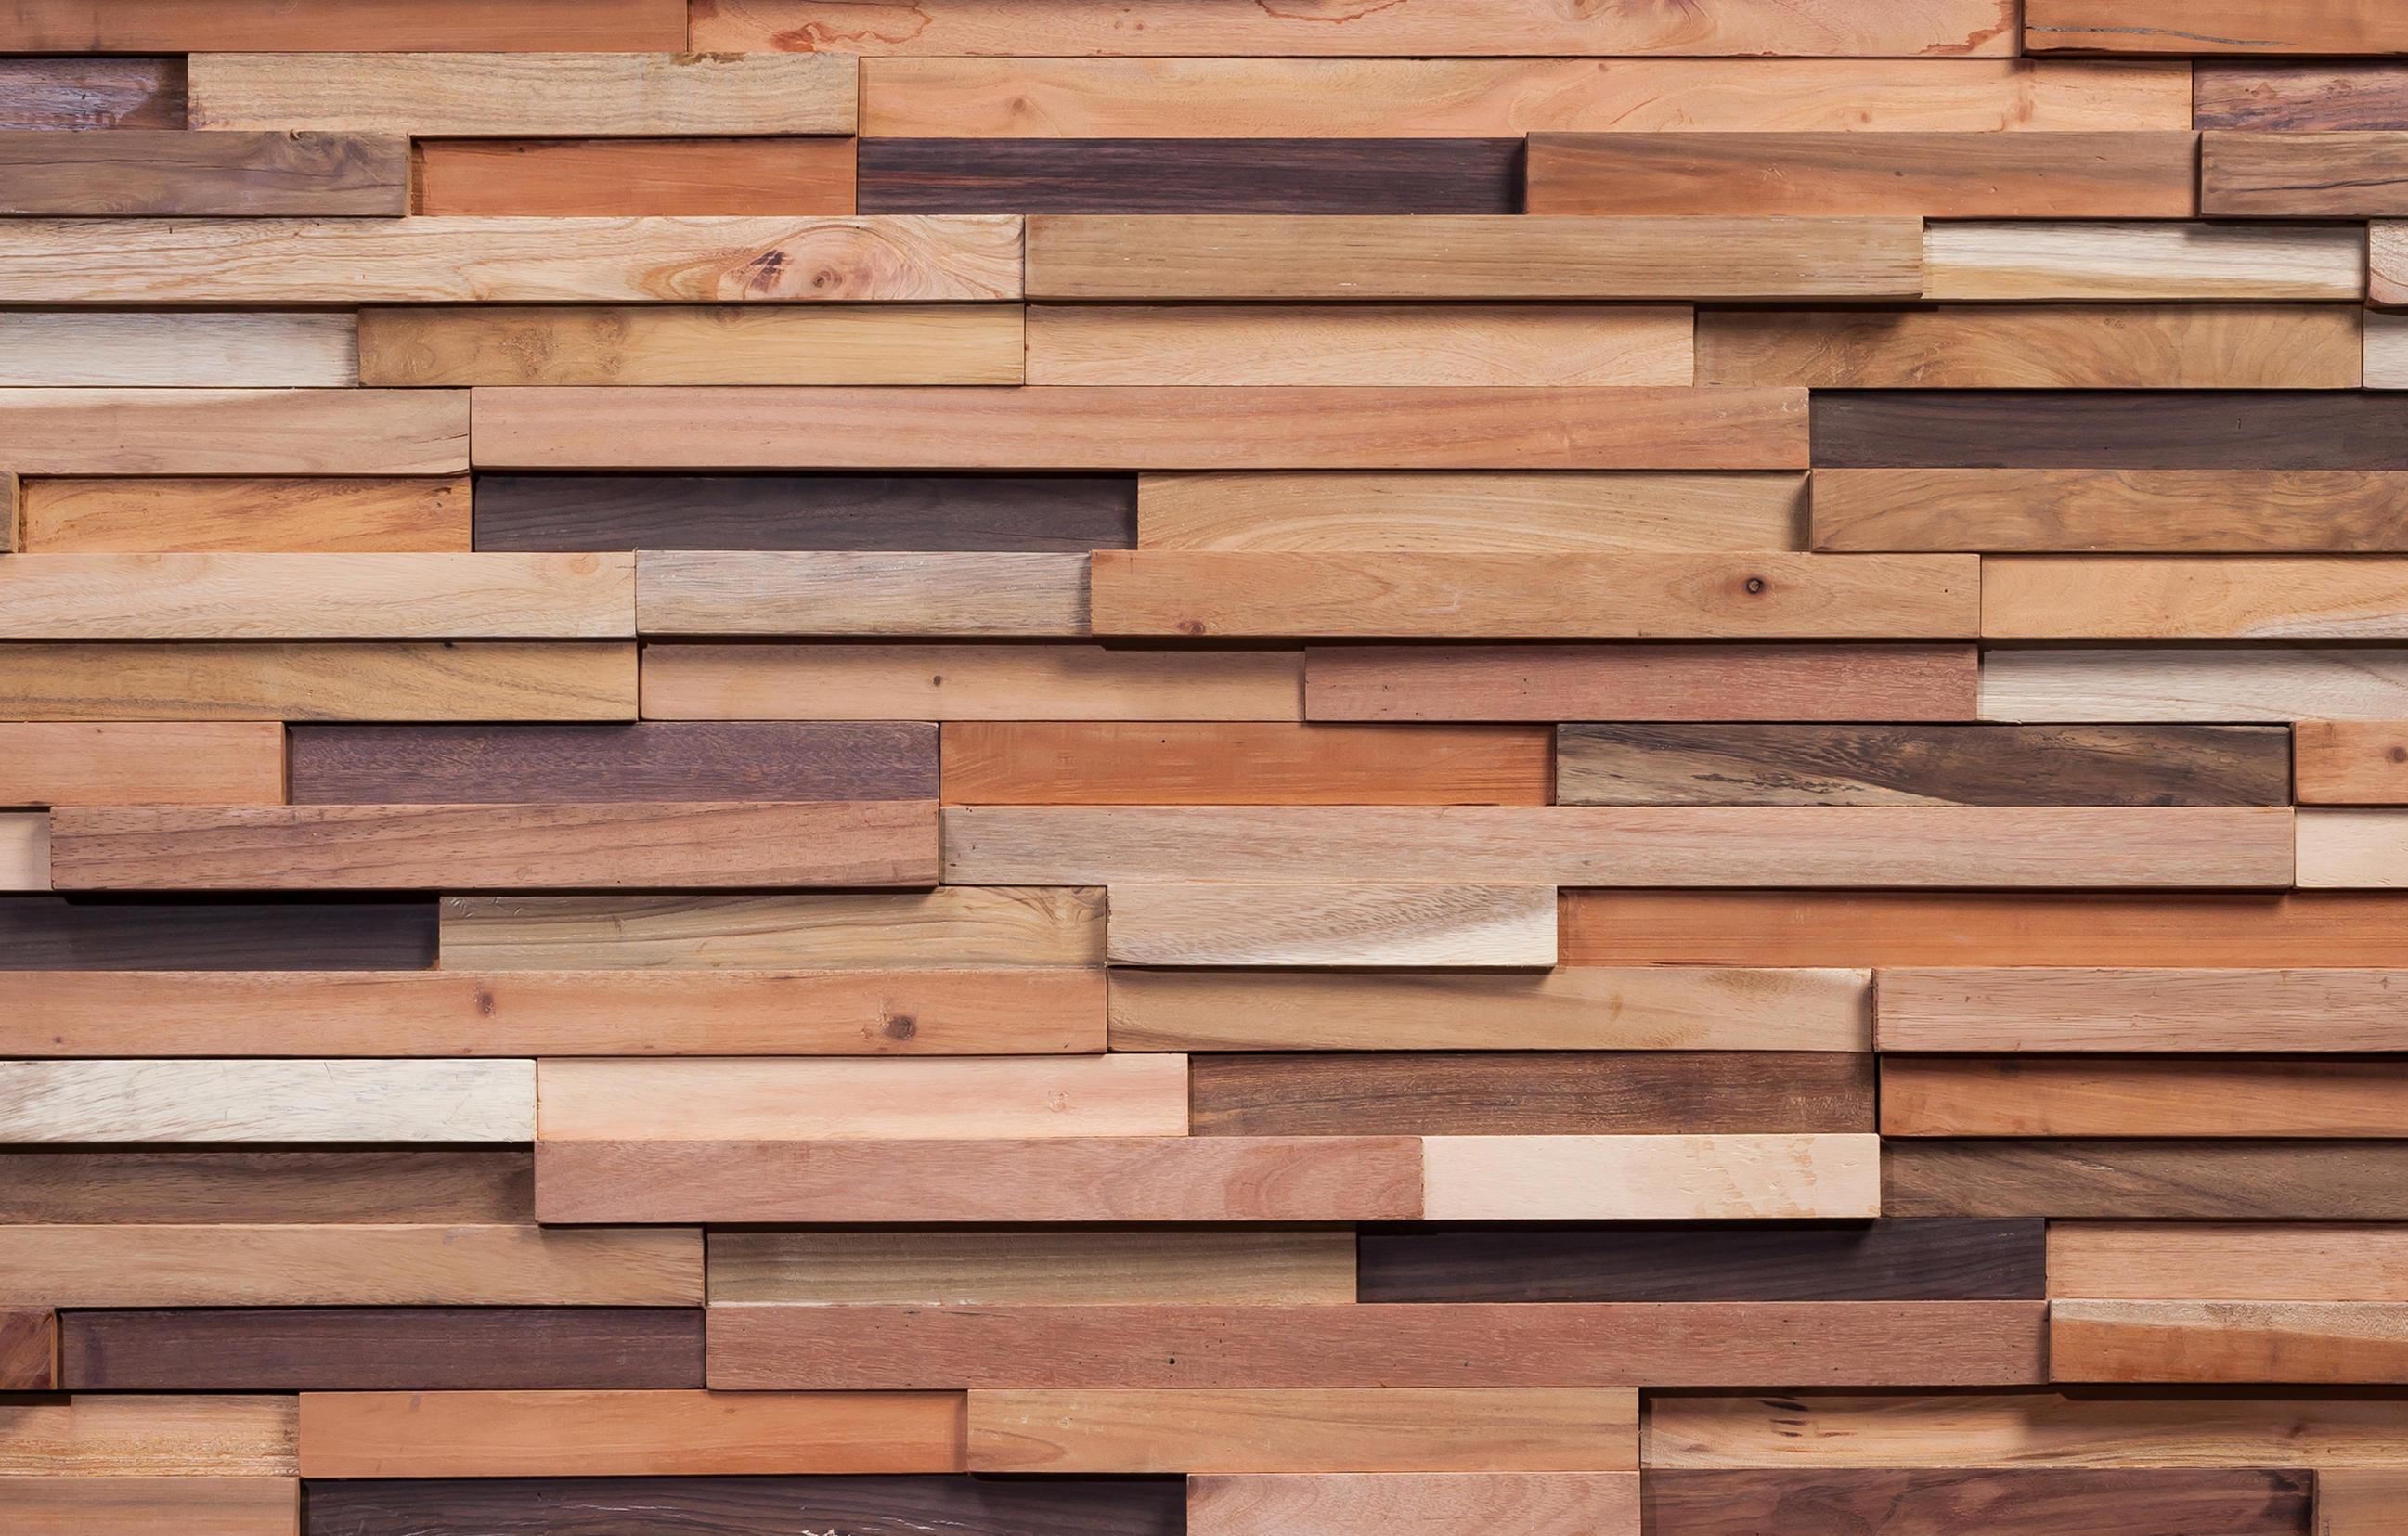 BLUNT Wood Panels From Wonderwall Studios Architonic